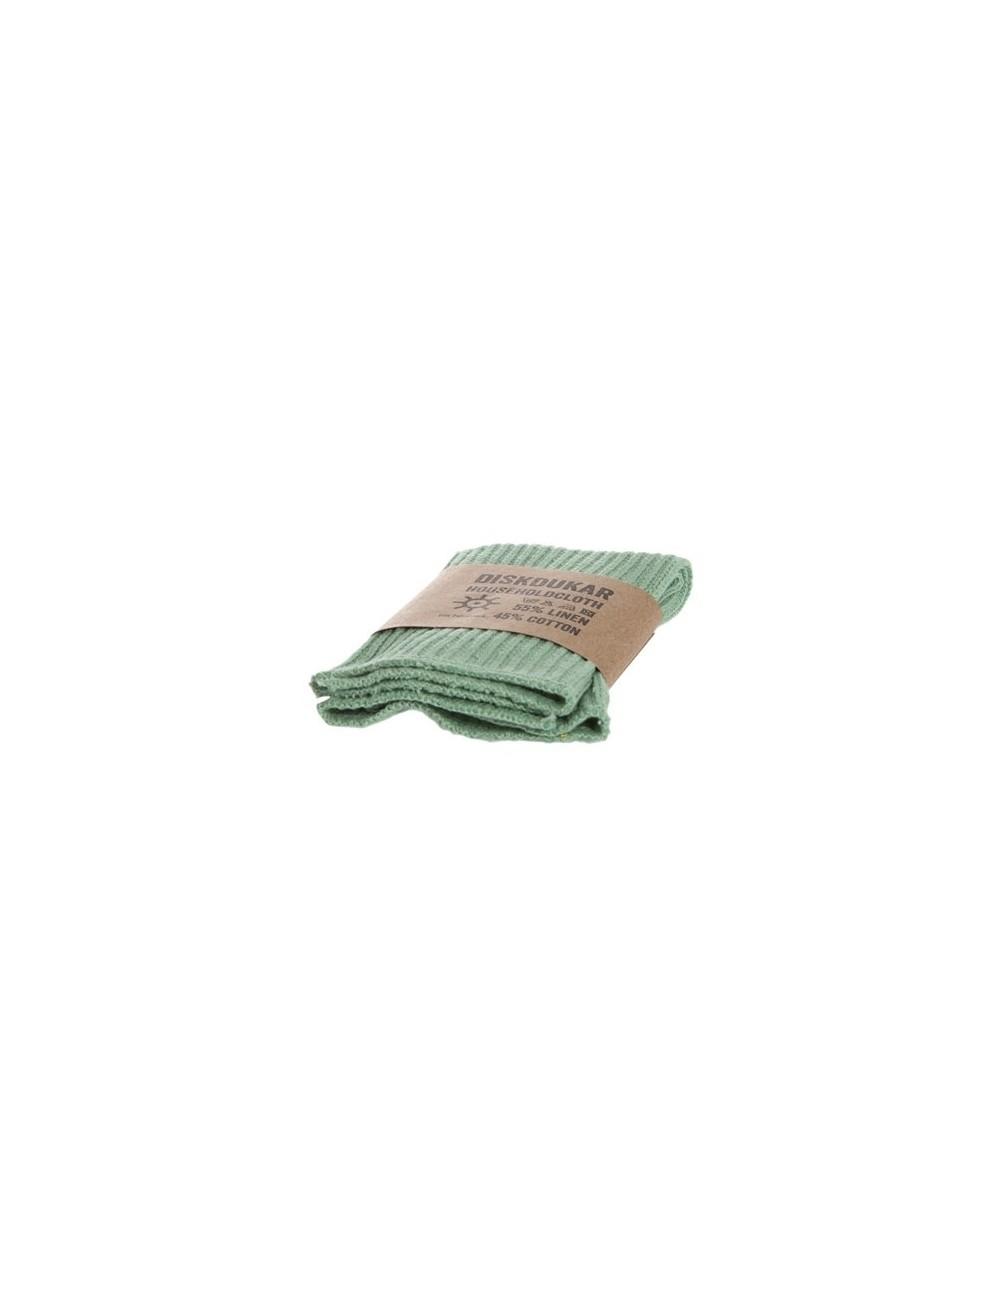 Lavette - Vert Mint